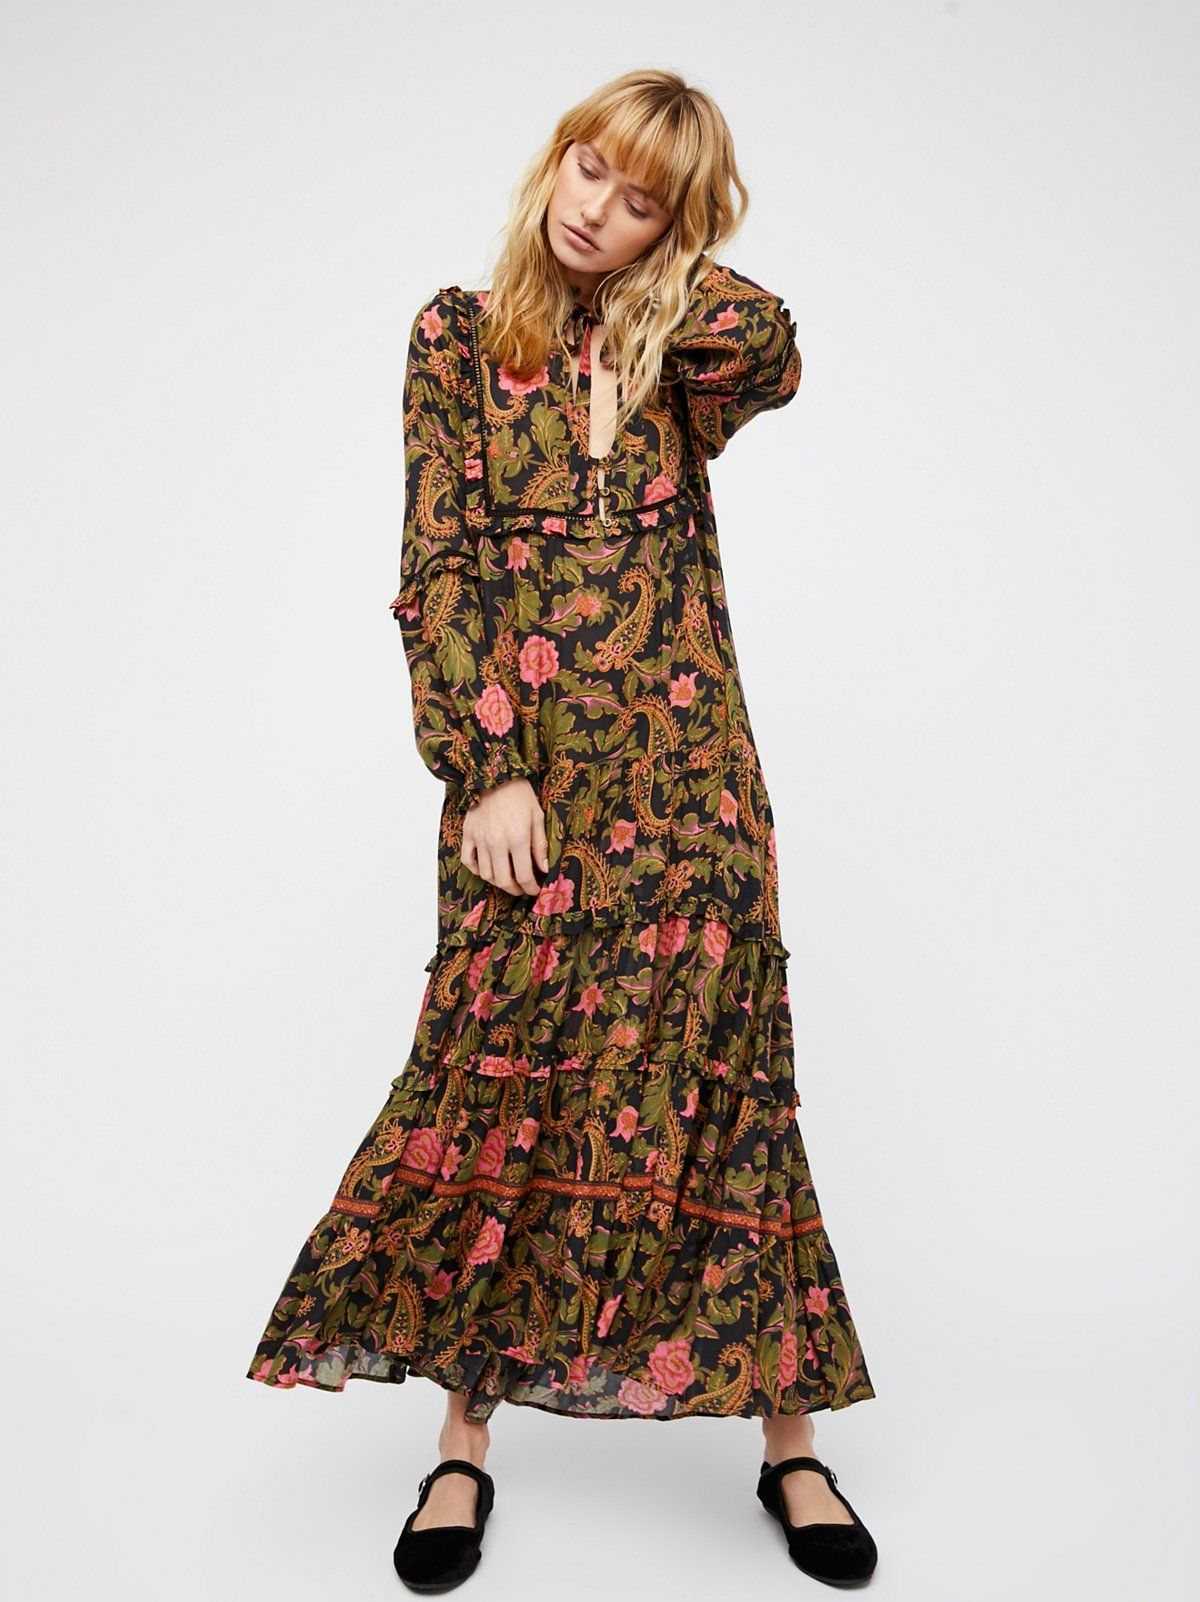 Etienne Maxi Dress Dream Closest Dresses Boho Dress Fashion